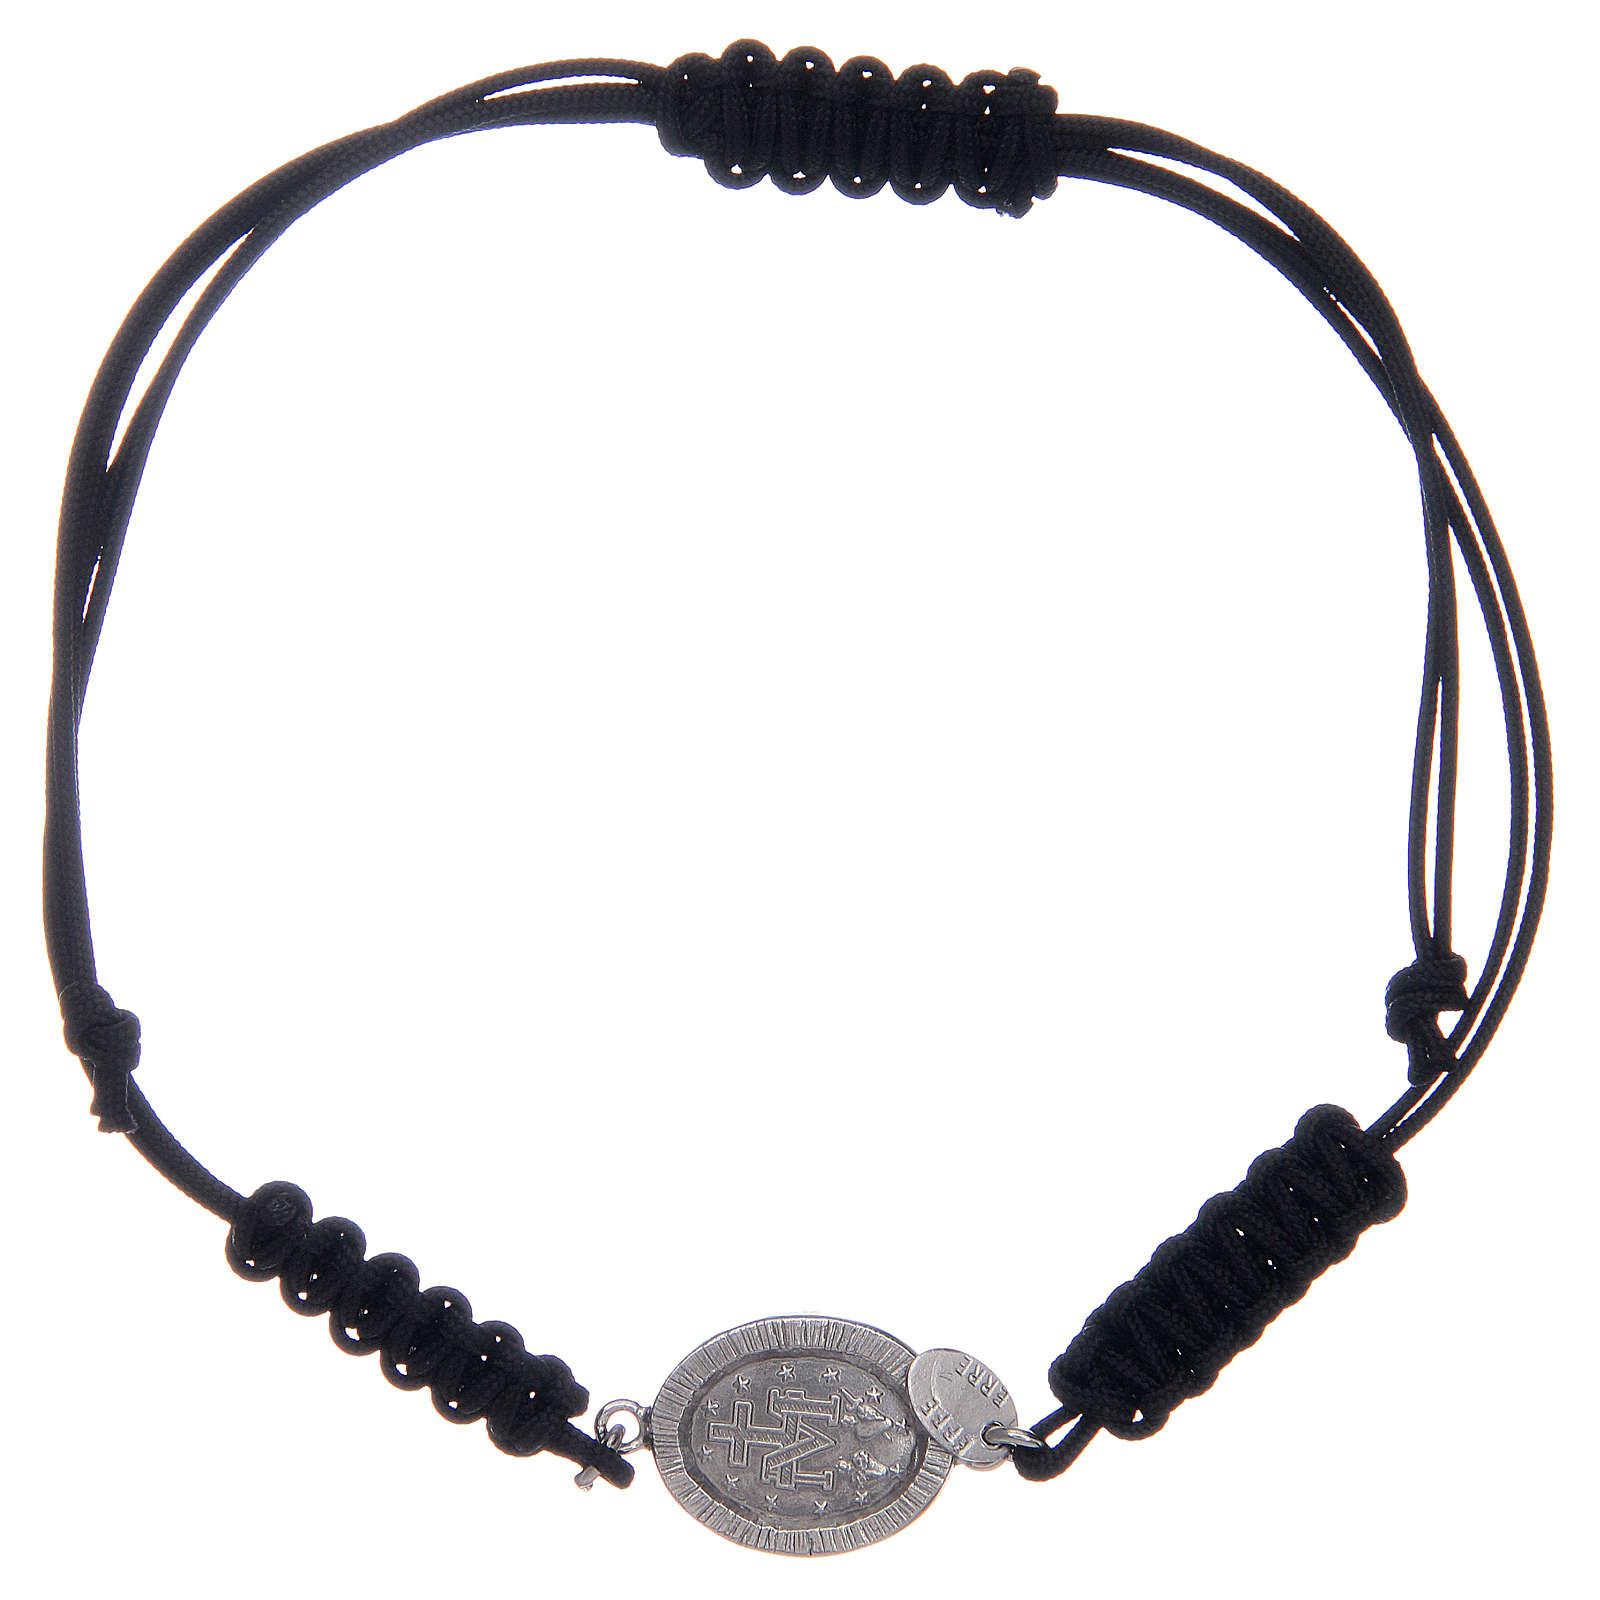 Pulsera cuerda plata 925 Milagrosa plateada zircones negros 4